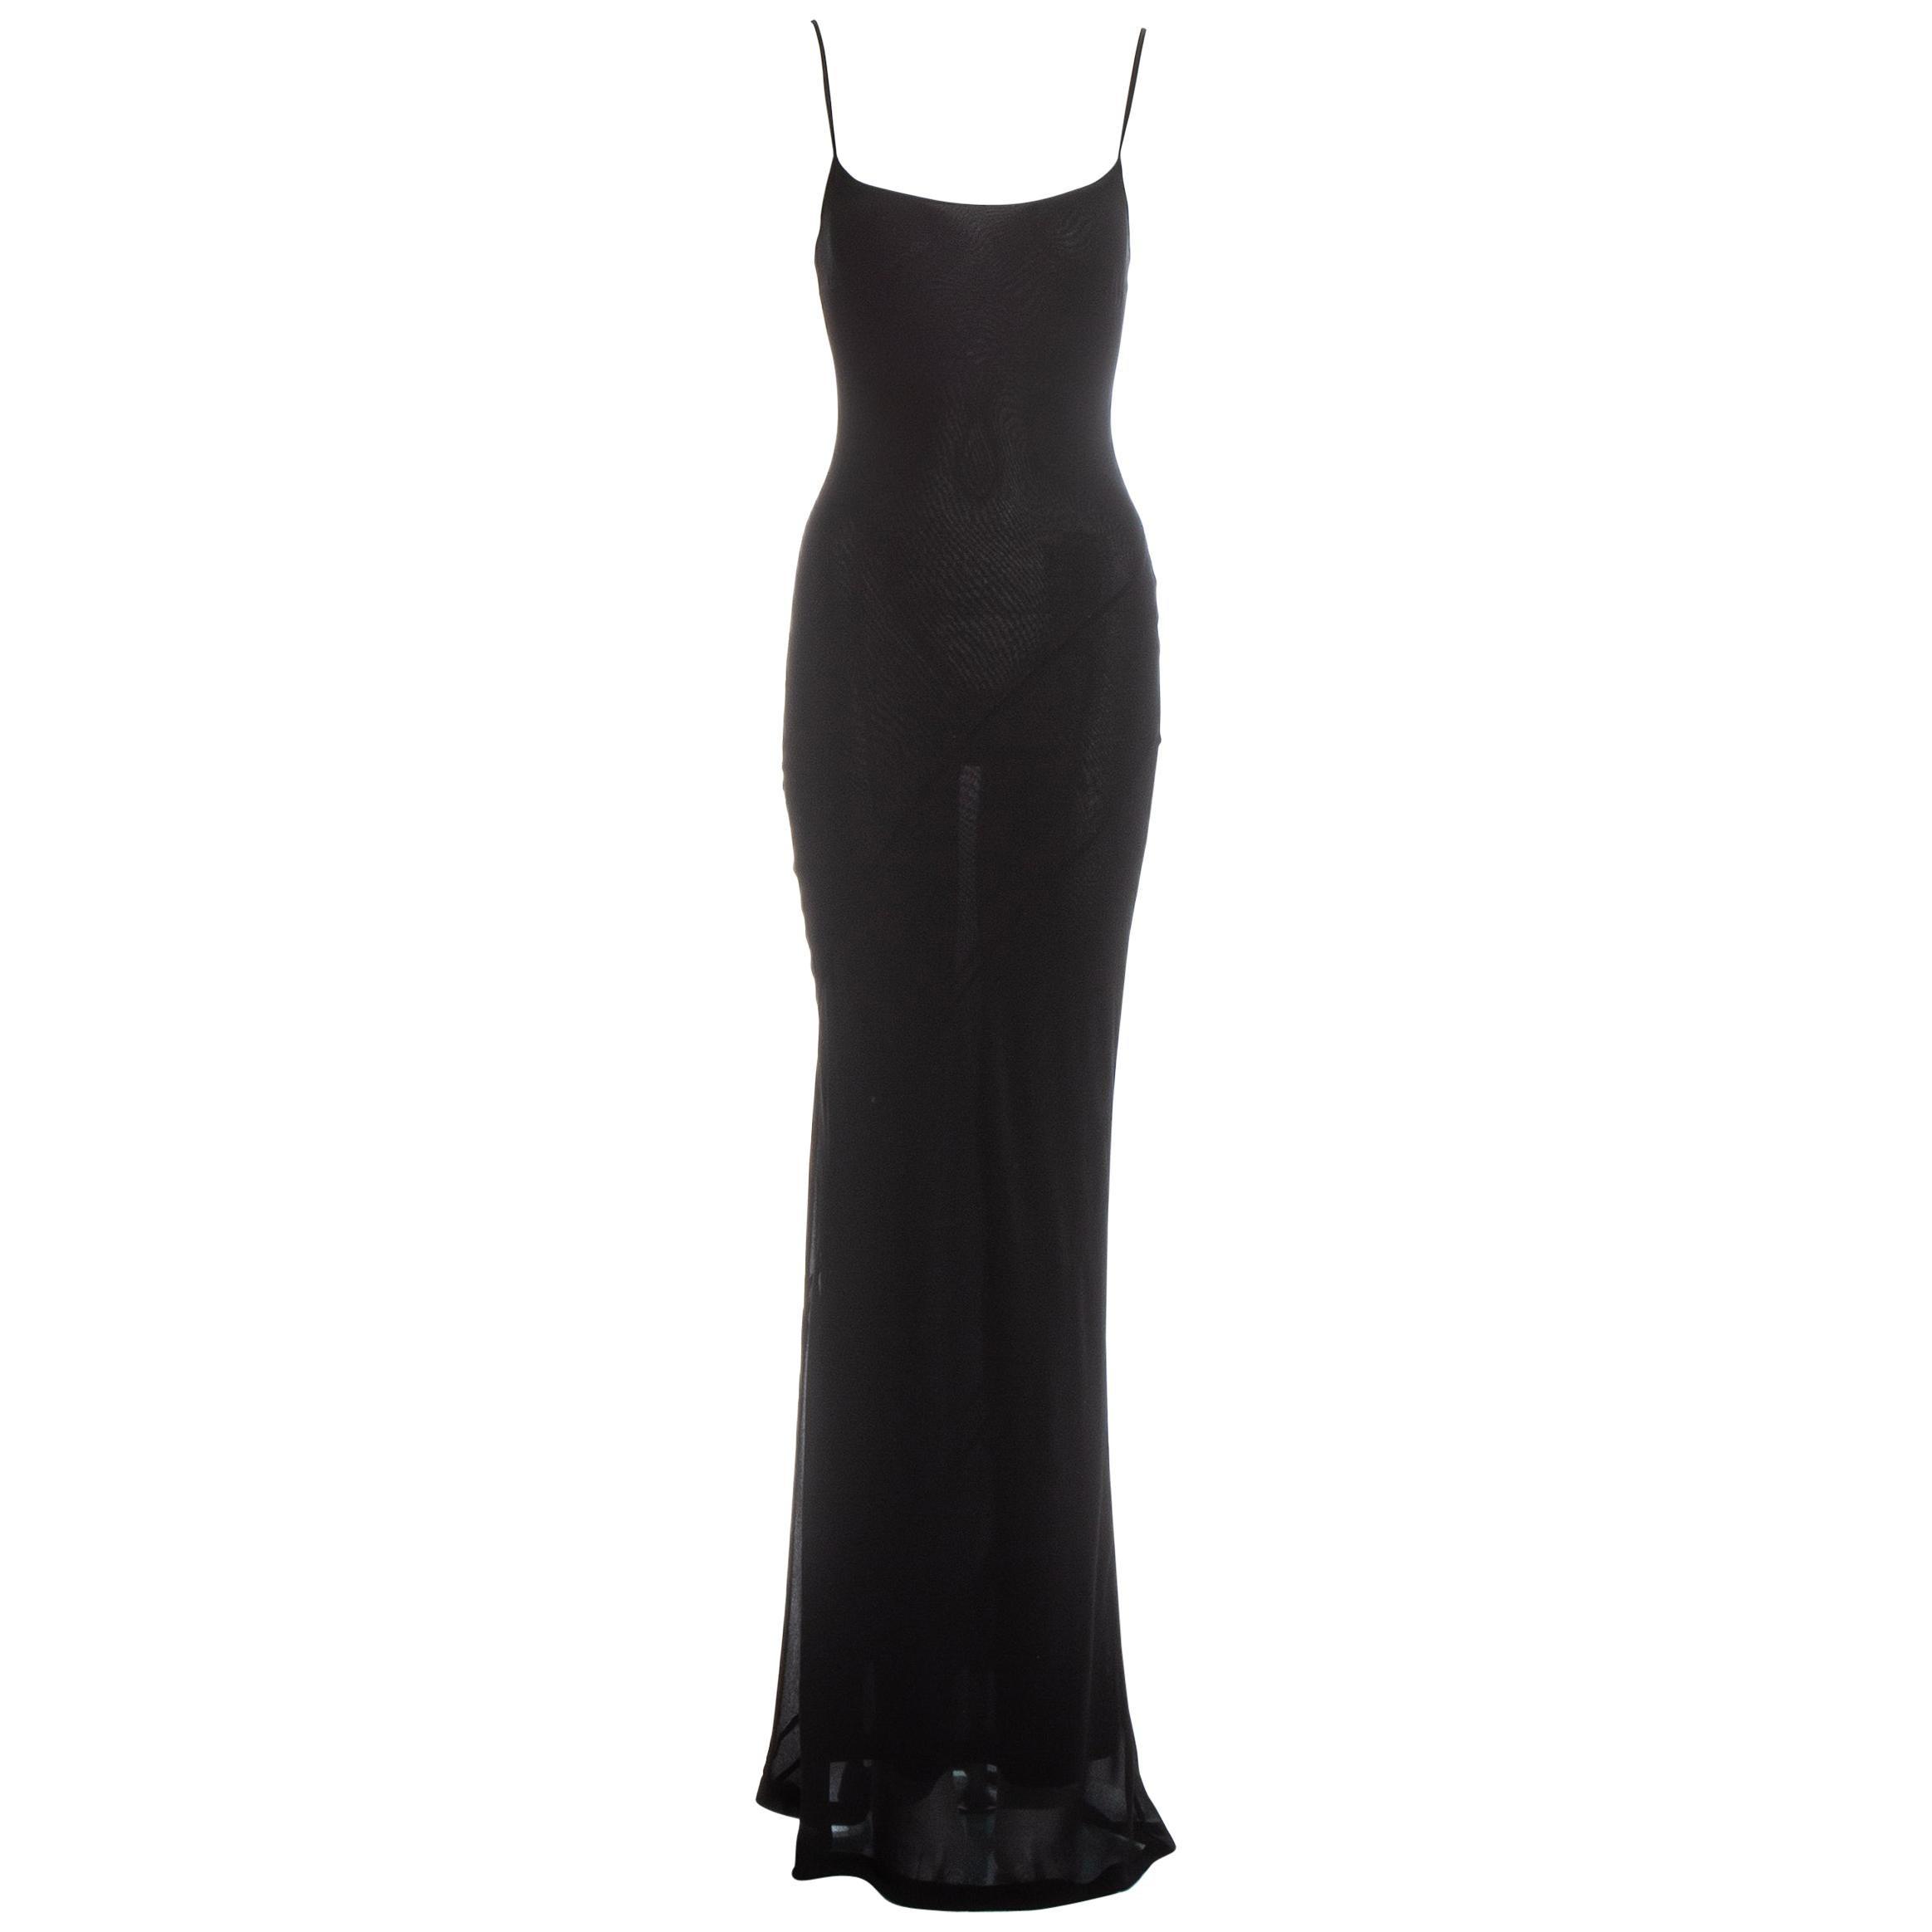 Gucci by Tom Ford black silk bias cut evening dress, ss 1997